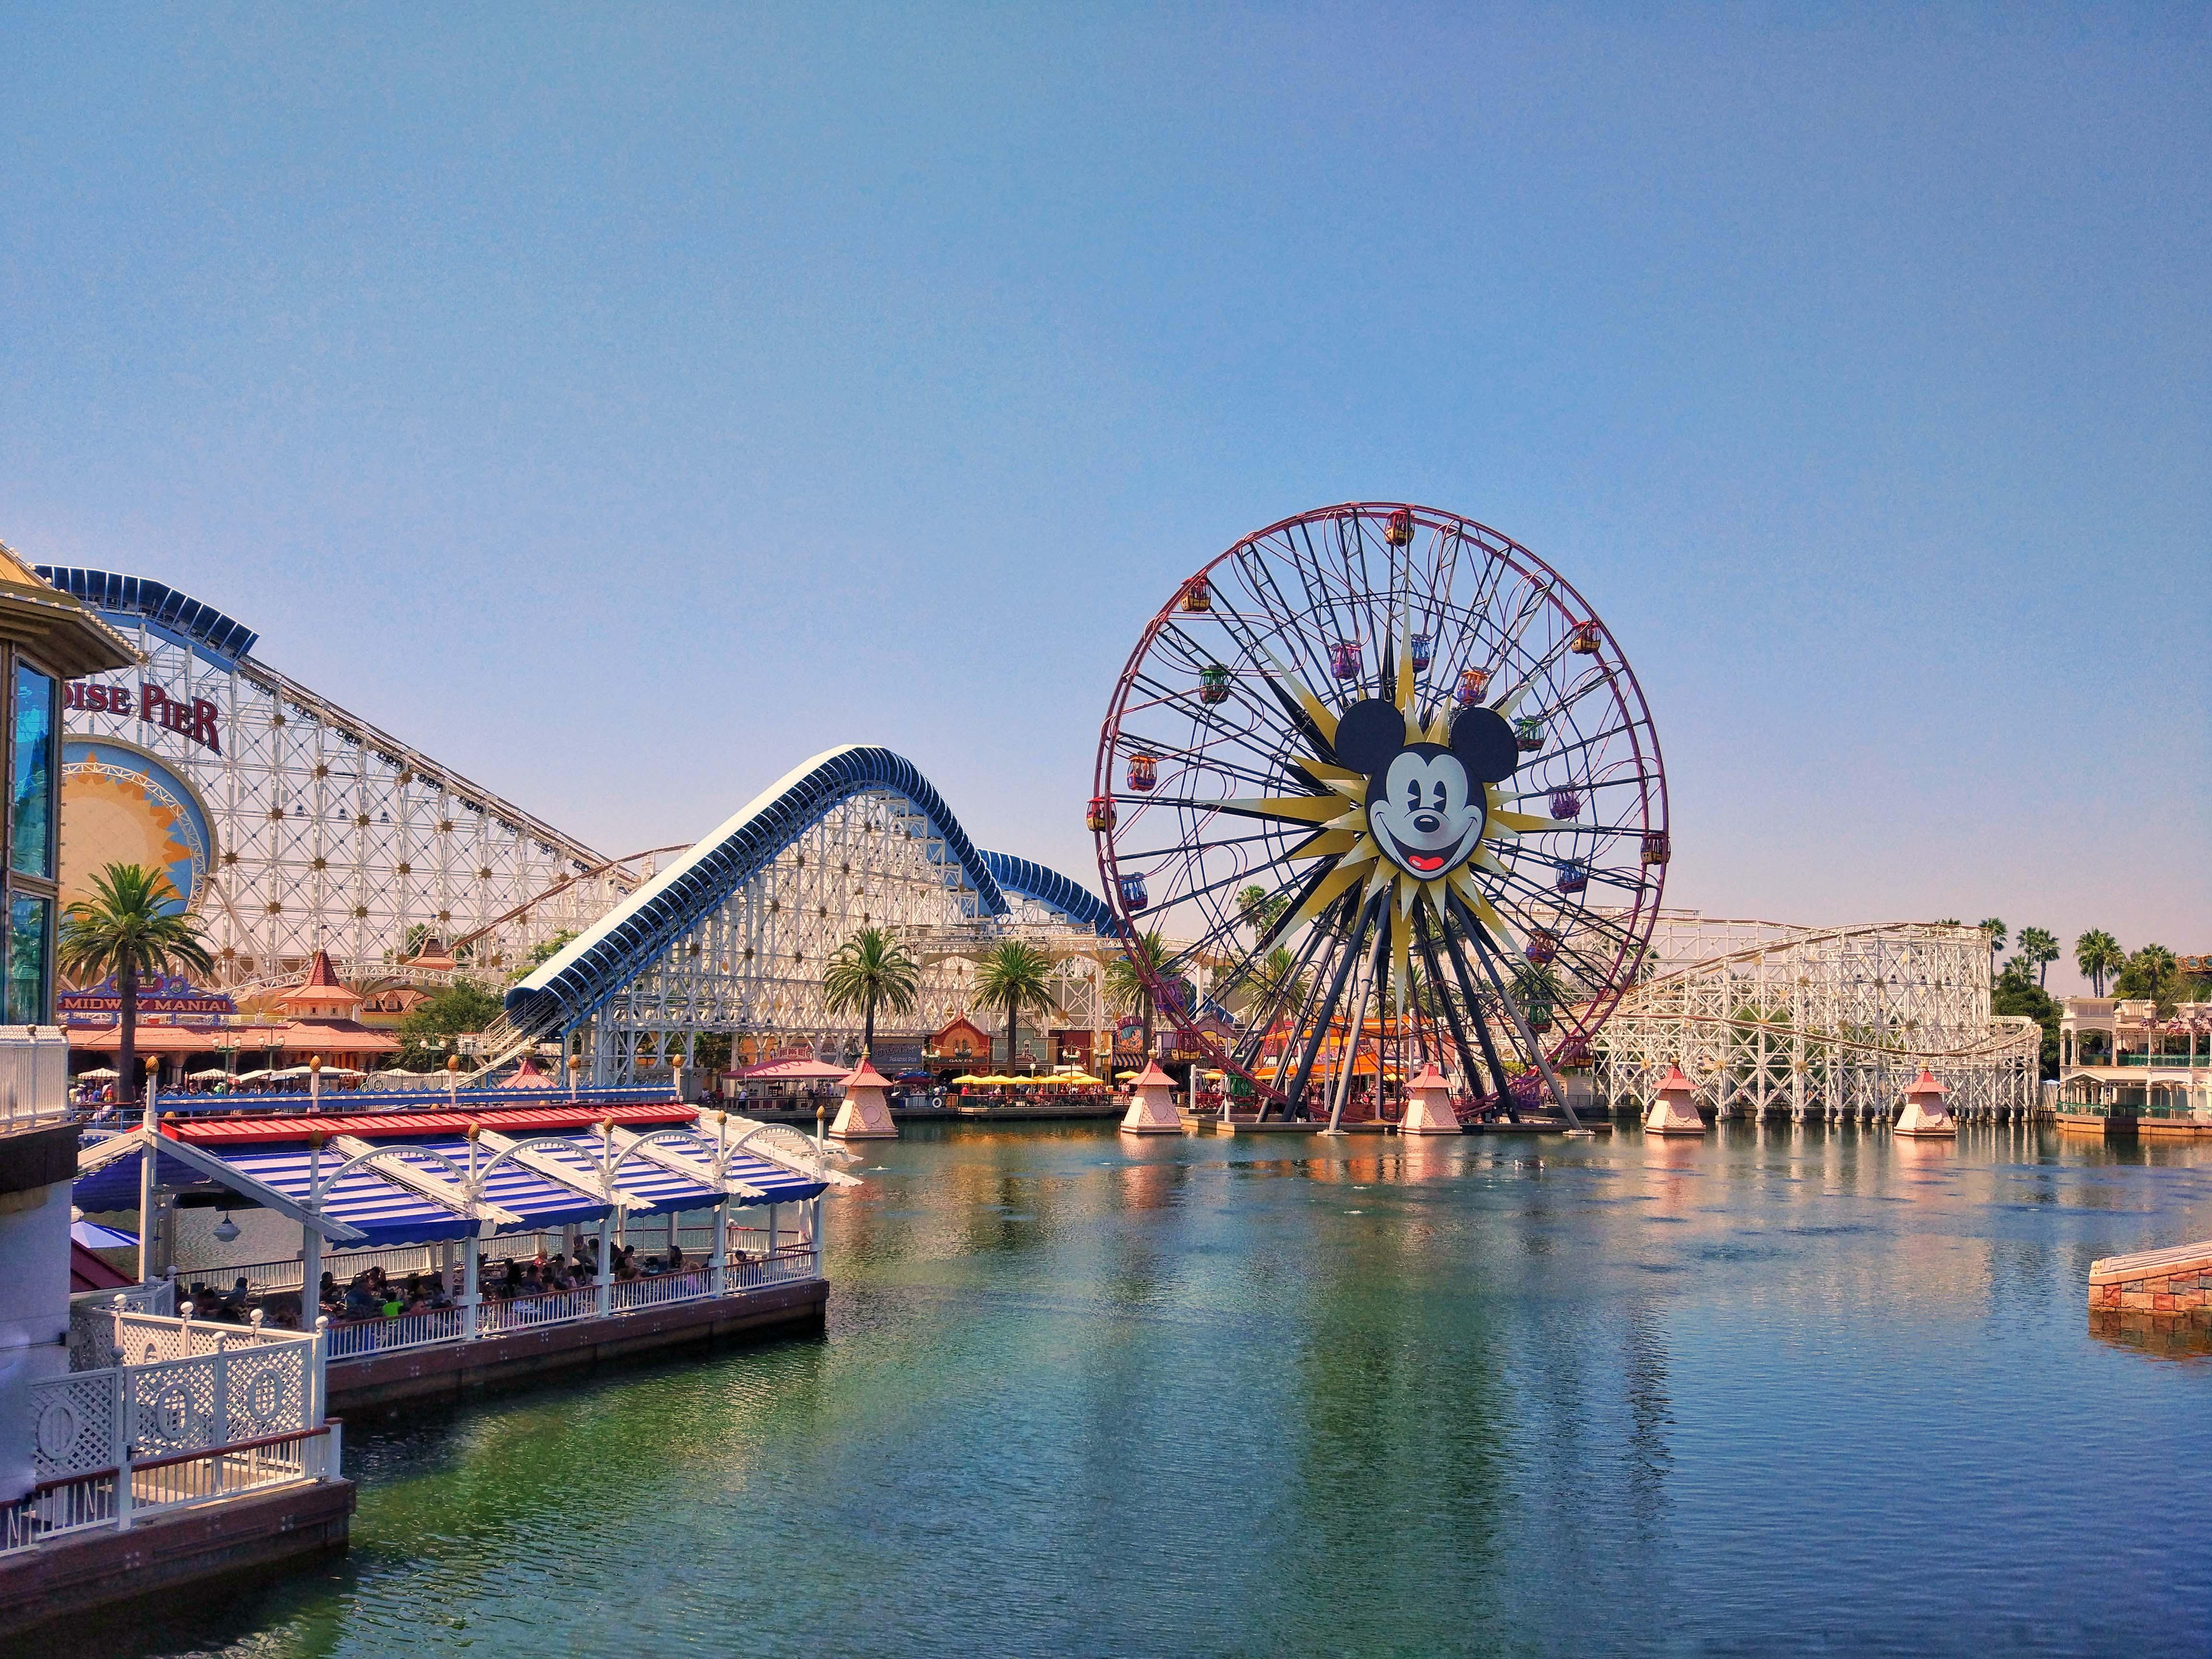 Disneyland California Tickets 1 Day Disneyland Ticket For